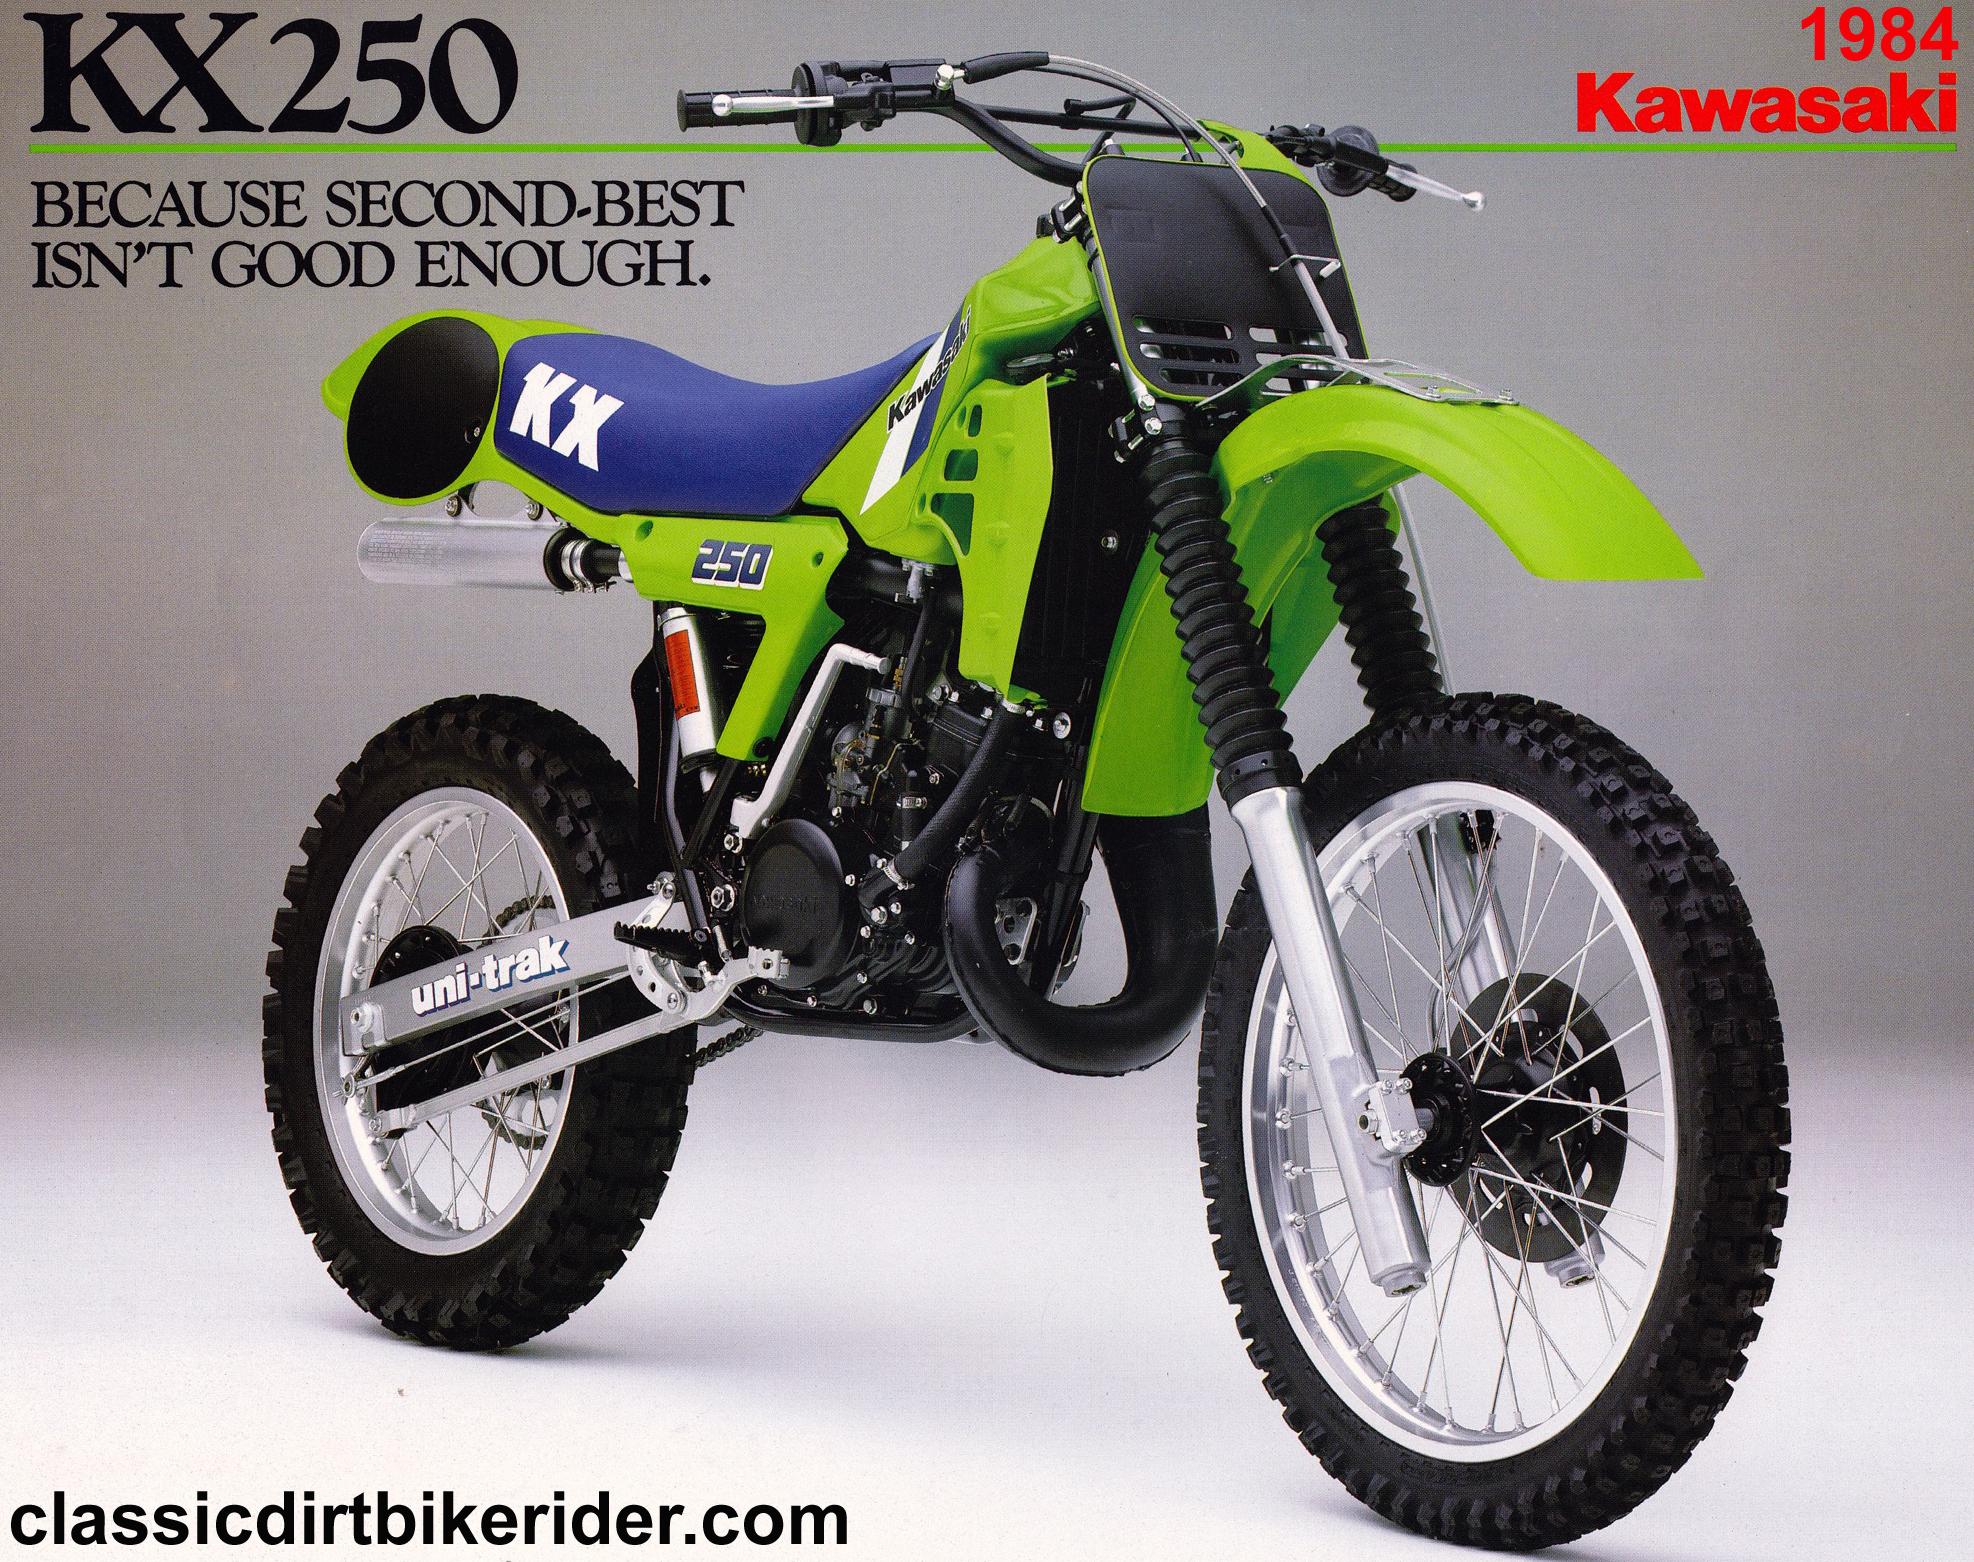 1984 KAWASAKI KX250 classicdirtbikerider..